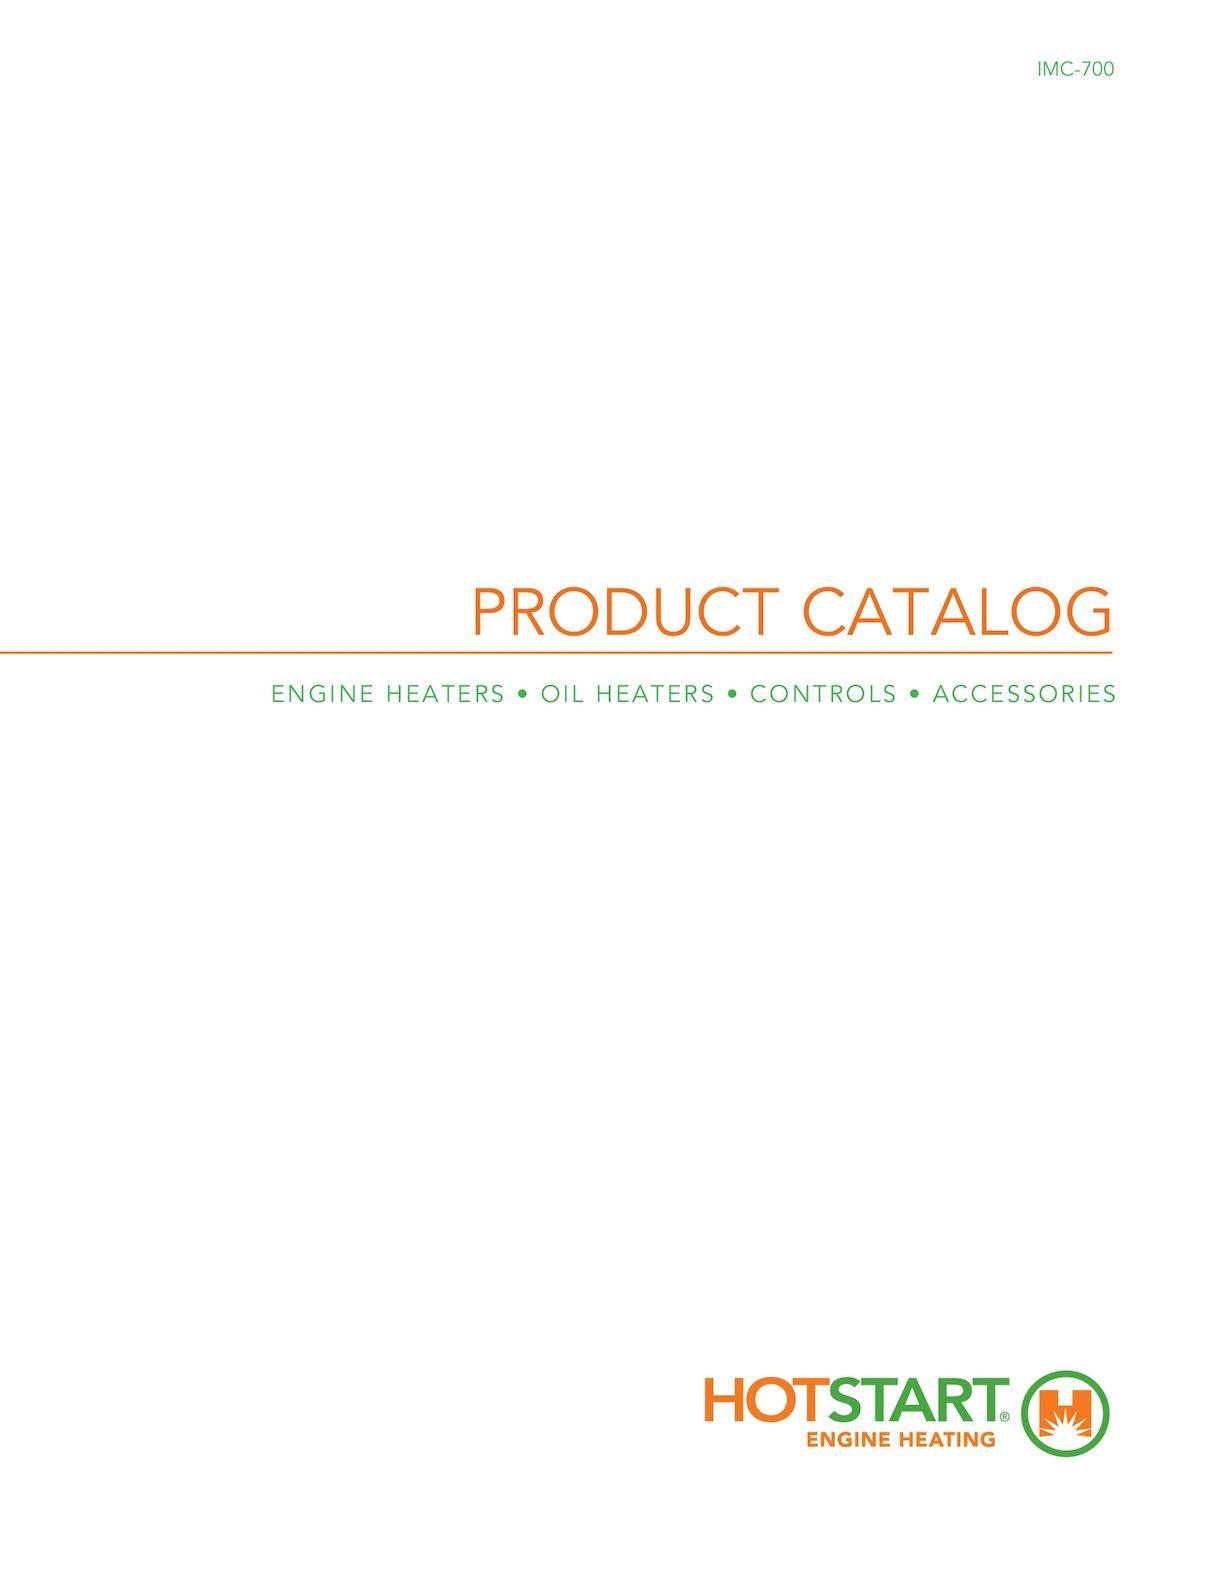 Calamo Hotstart 2017 Wiring Diagram For An Rv Water Pump Along With Kubota Glow Plug Relay